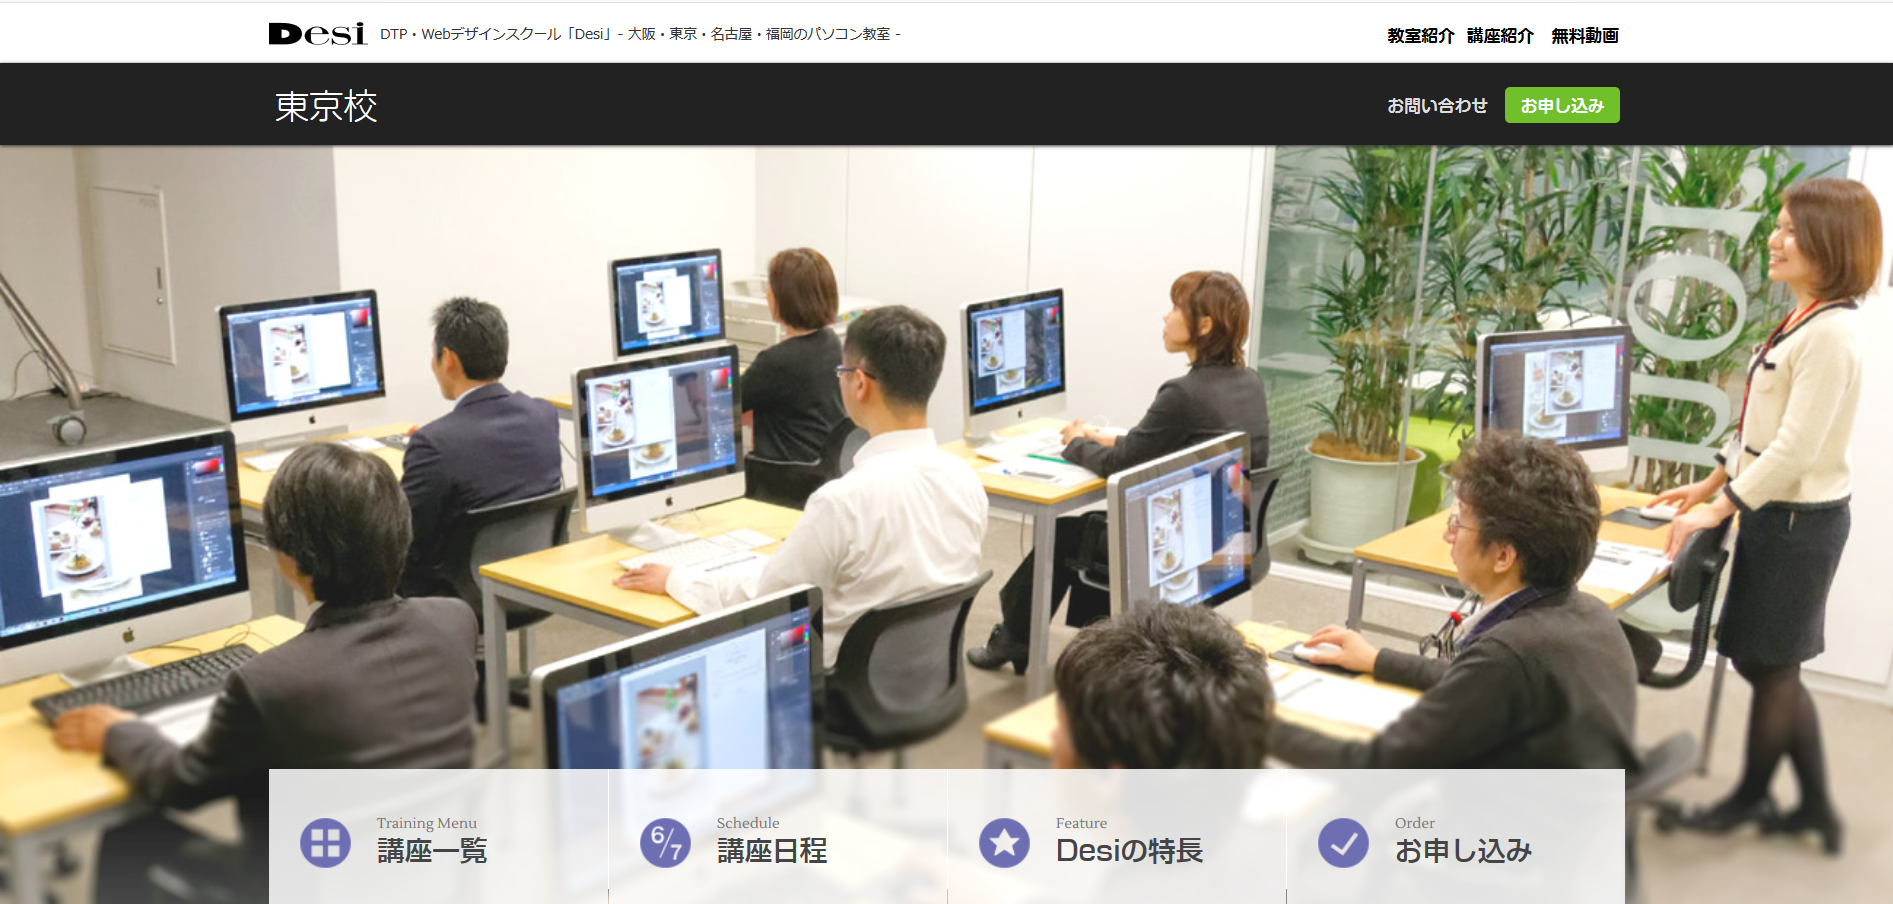 DTP・Webデザイン教室 Desi 東京校の評判・口コミ